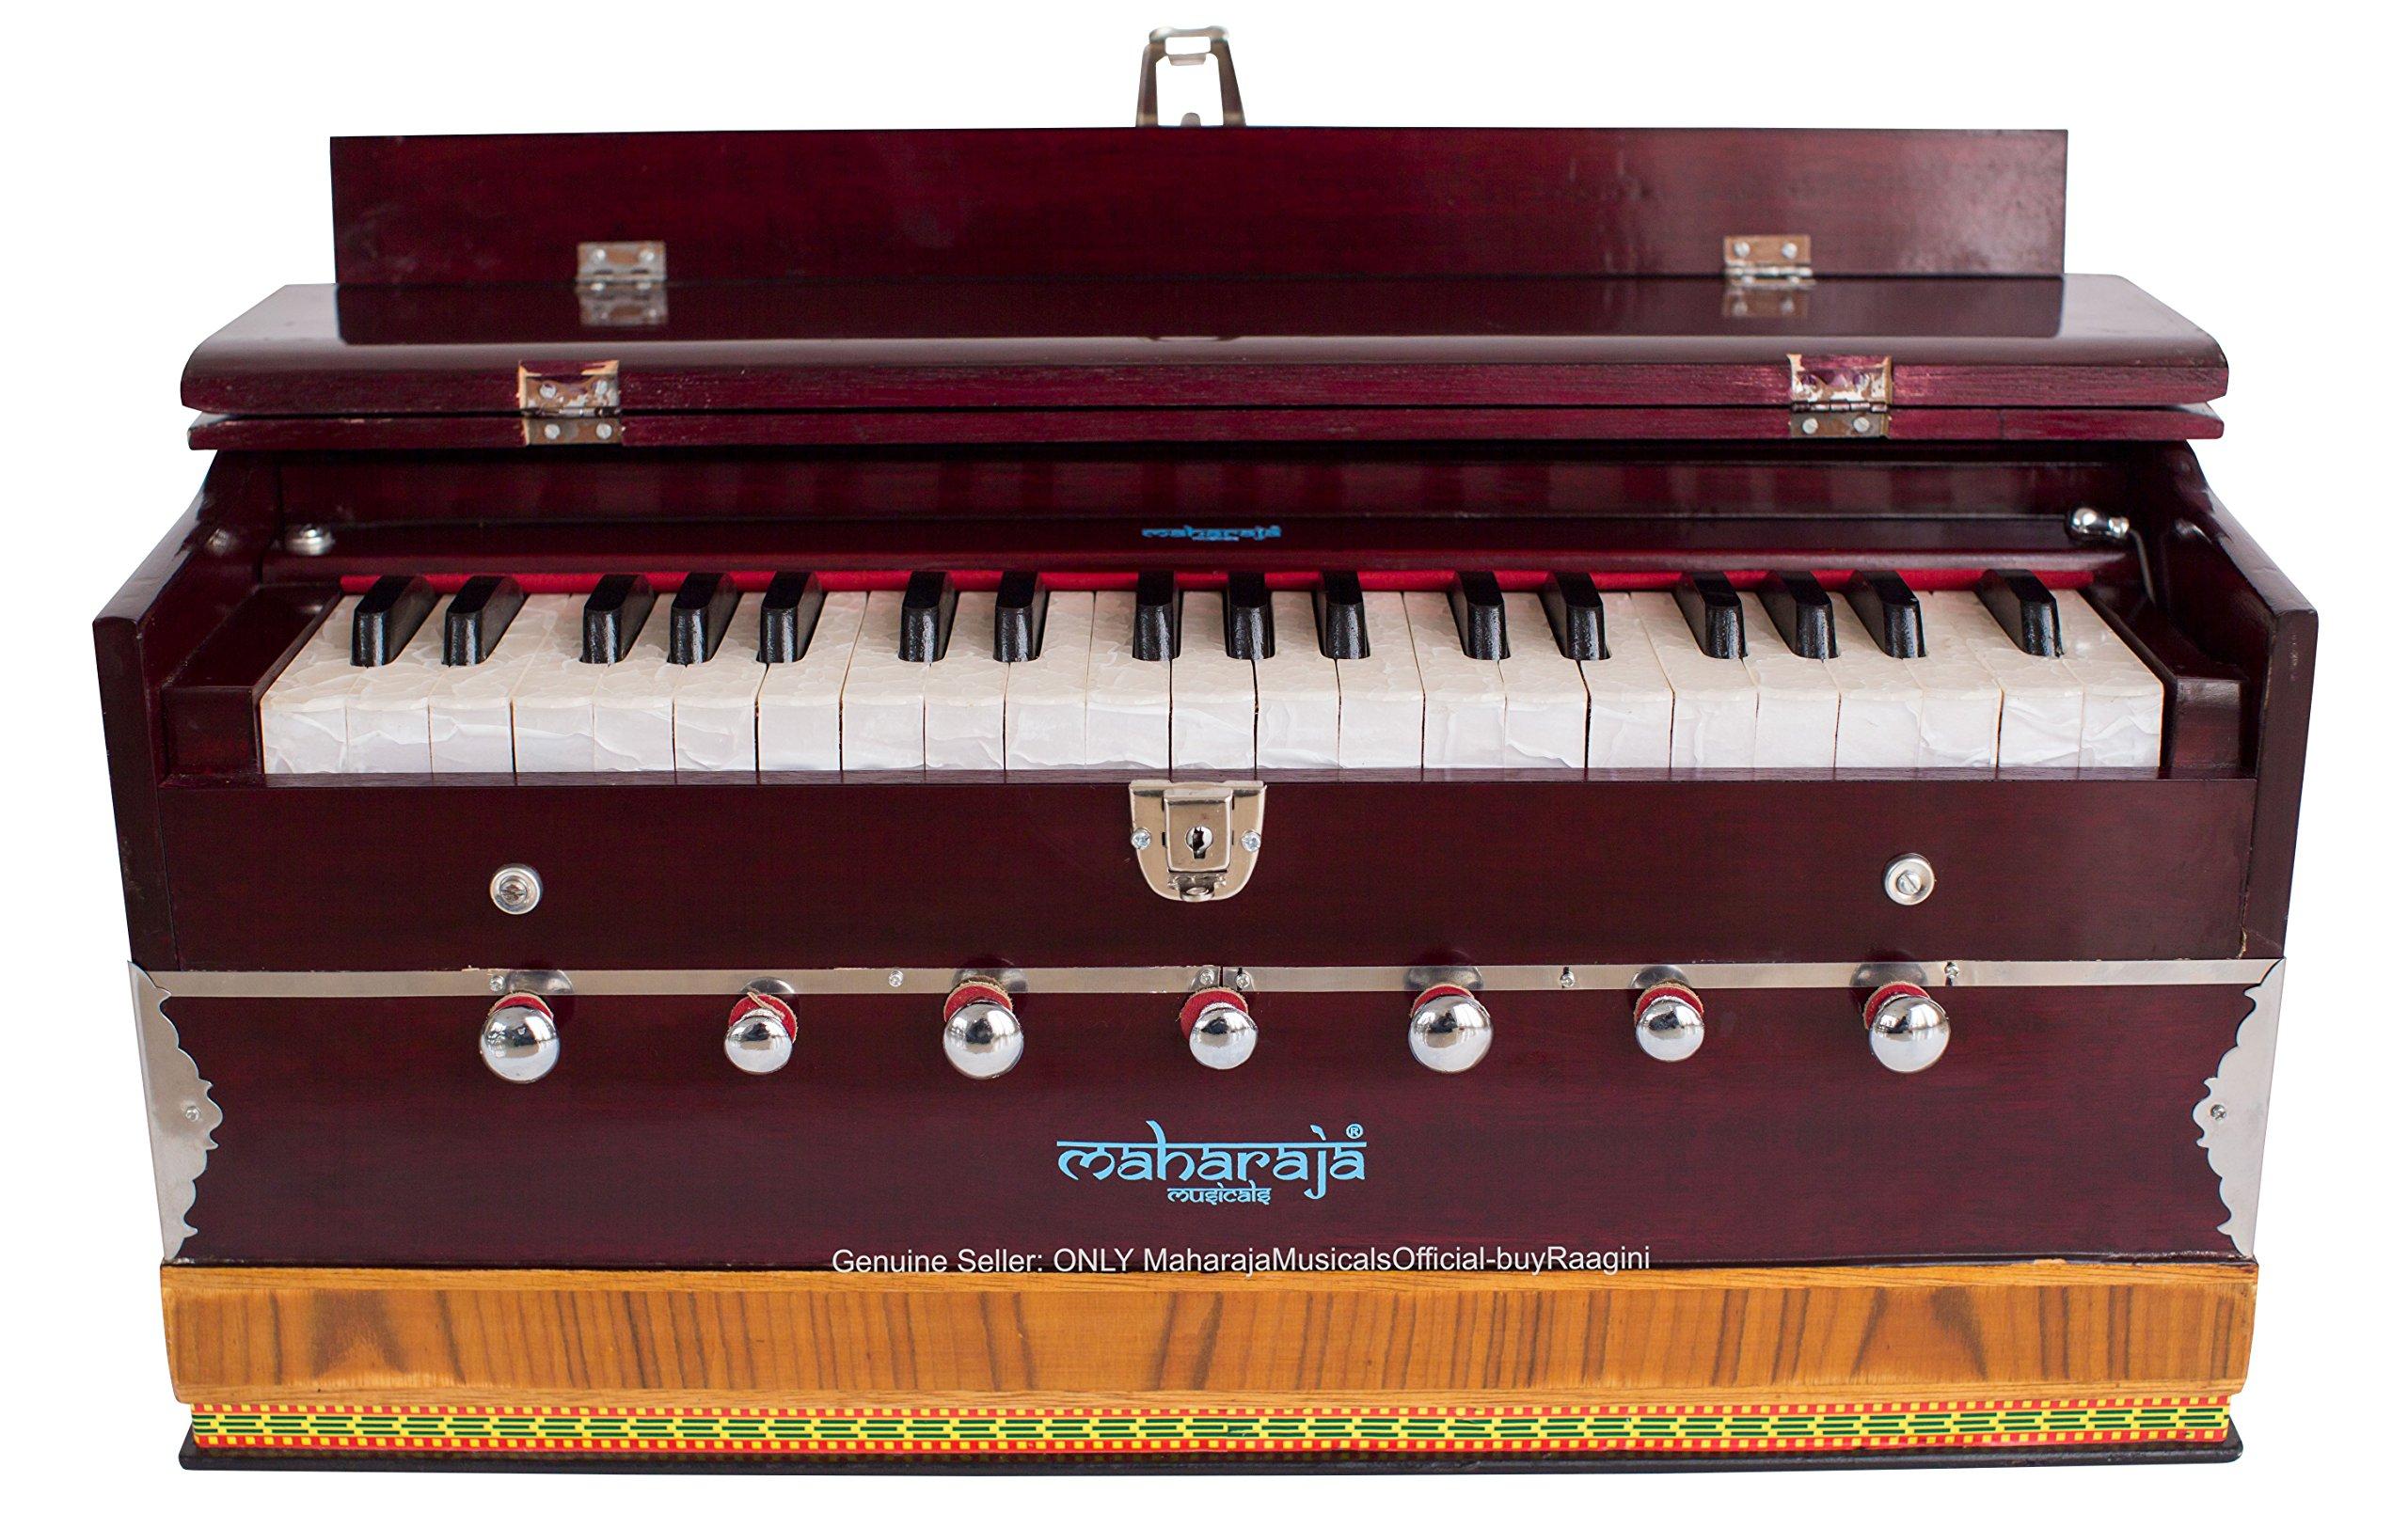 Harmonium #1, Maharaja Musicals, Handmade Harmonium, 3 1/4 Octave (Saptak), 7 Stop, Standing, Coupler, Multi Bellow, Book & Padded Bag, Tuned A440, Dark Mahogany Color, PDI-DB by Maharaja Musicals